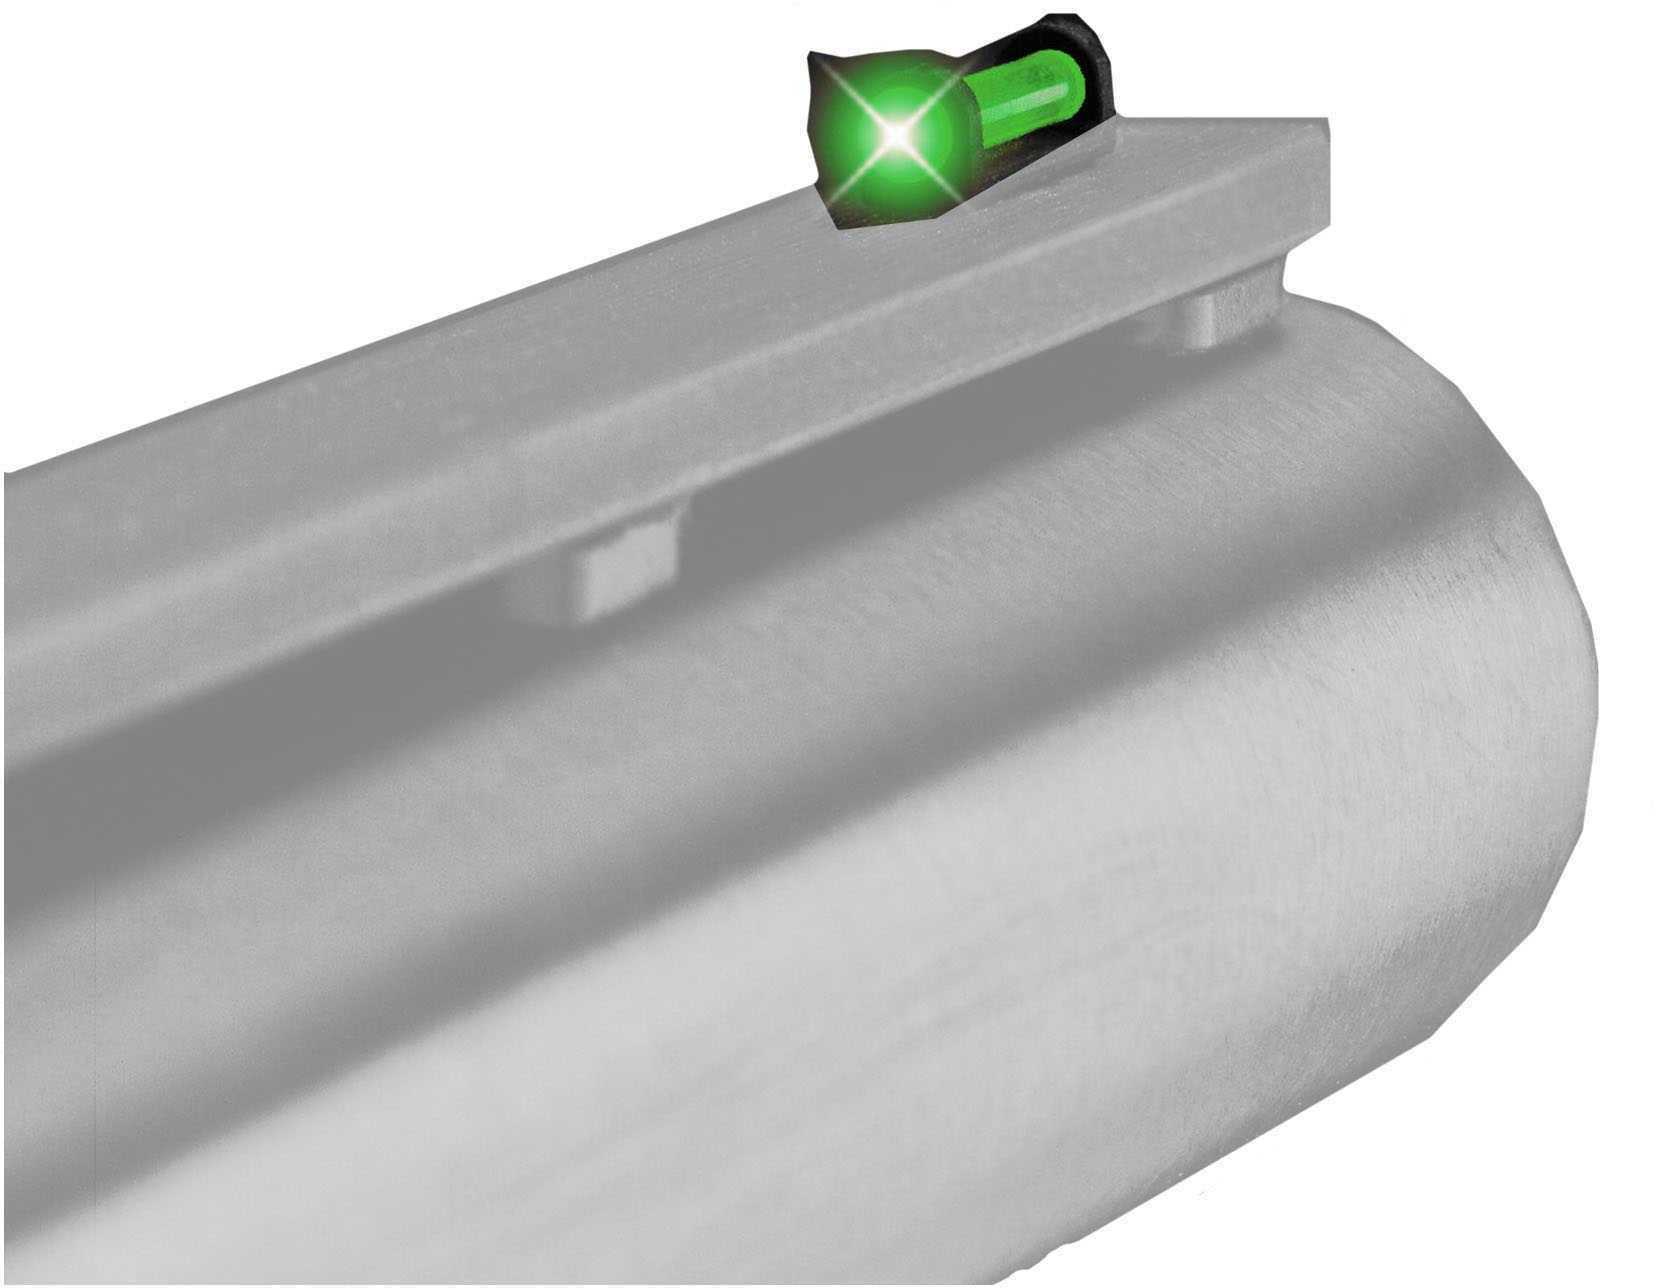 Truglo Metal Long Bead Shotgun Sights 5-40 Green Md: TG947DGM